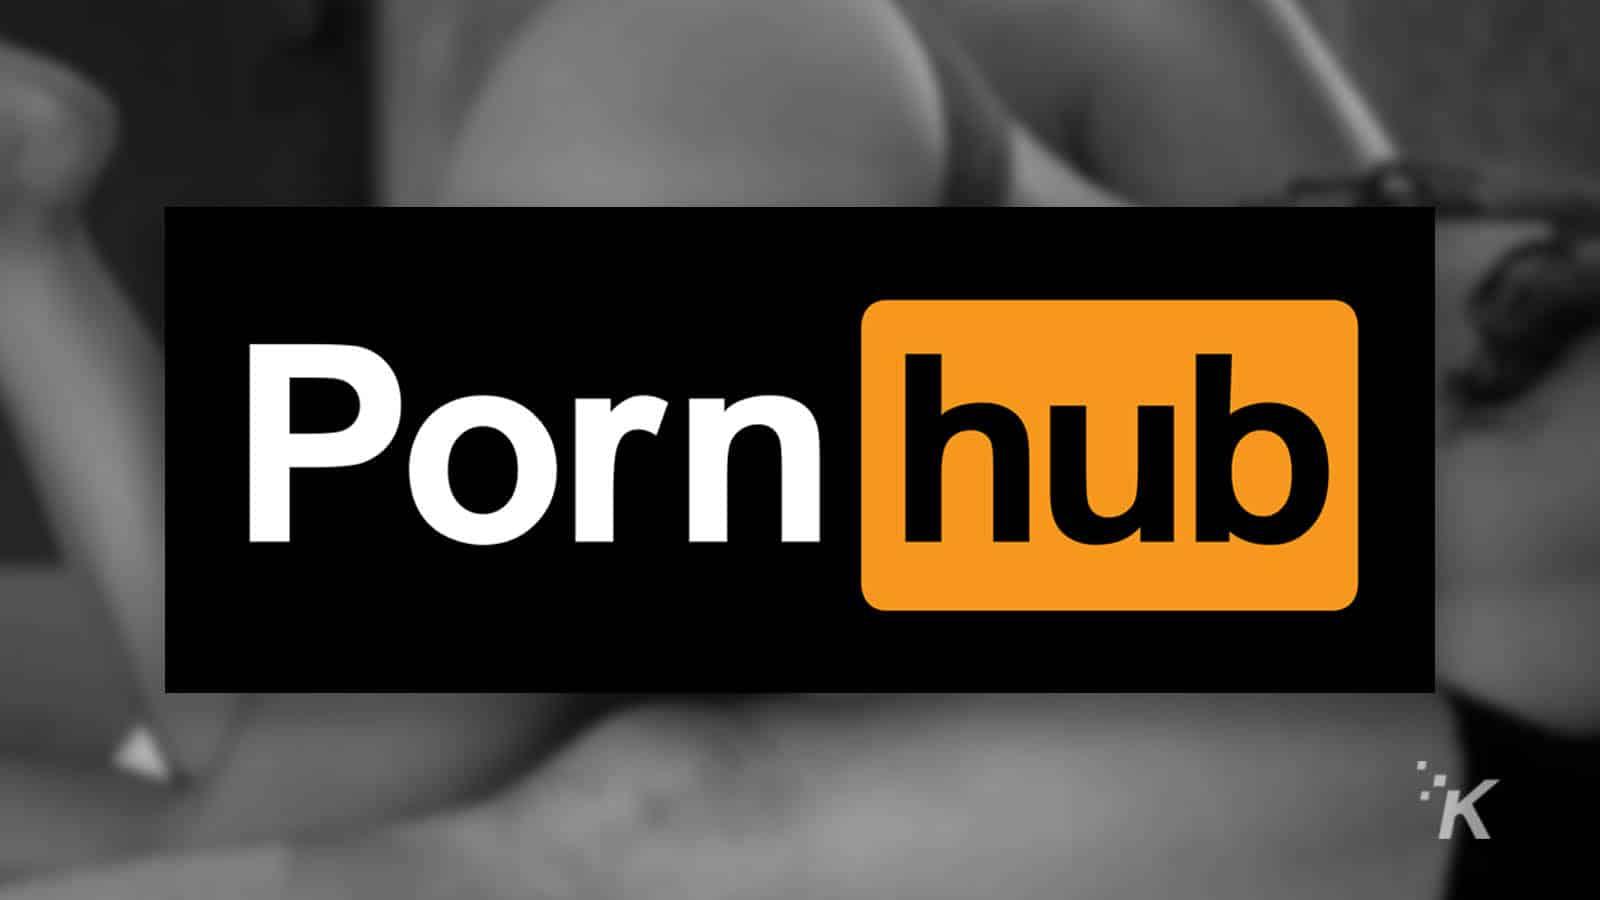 pornhub logo and blurred background